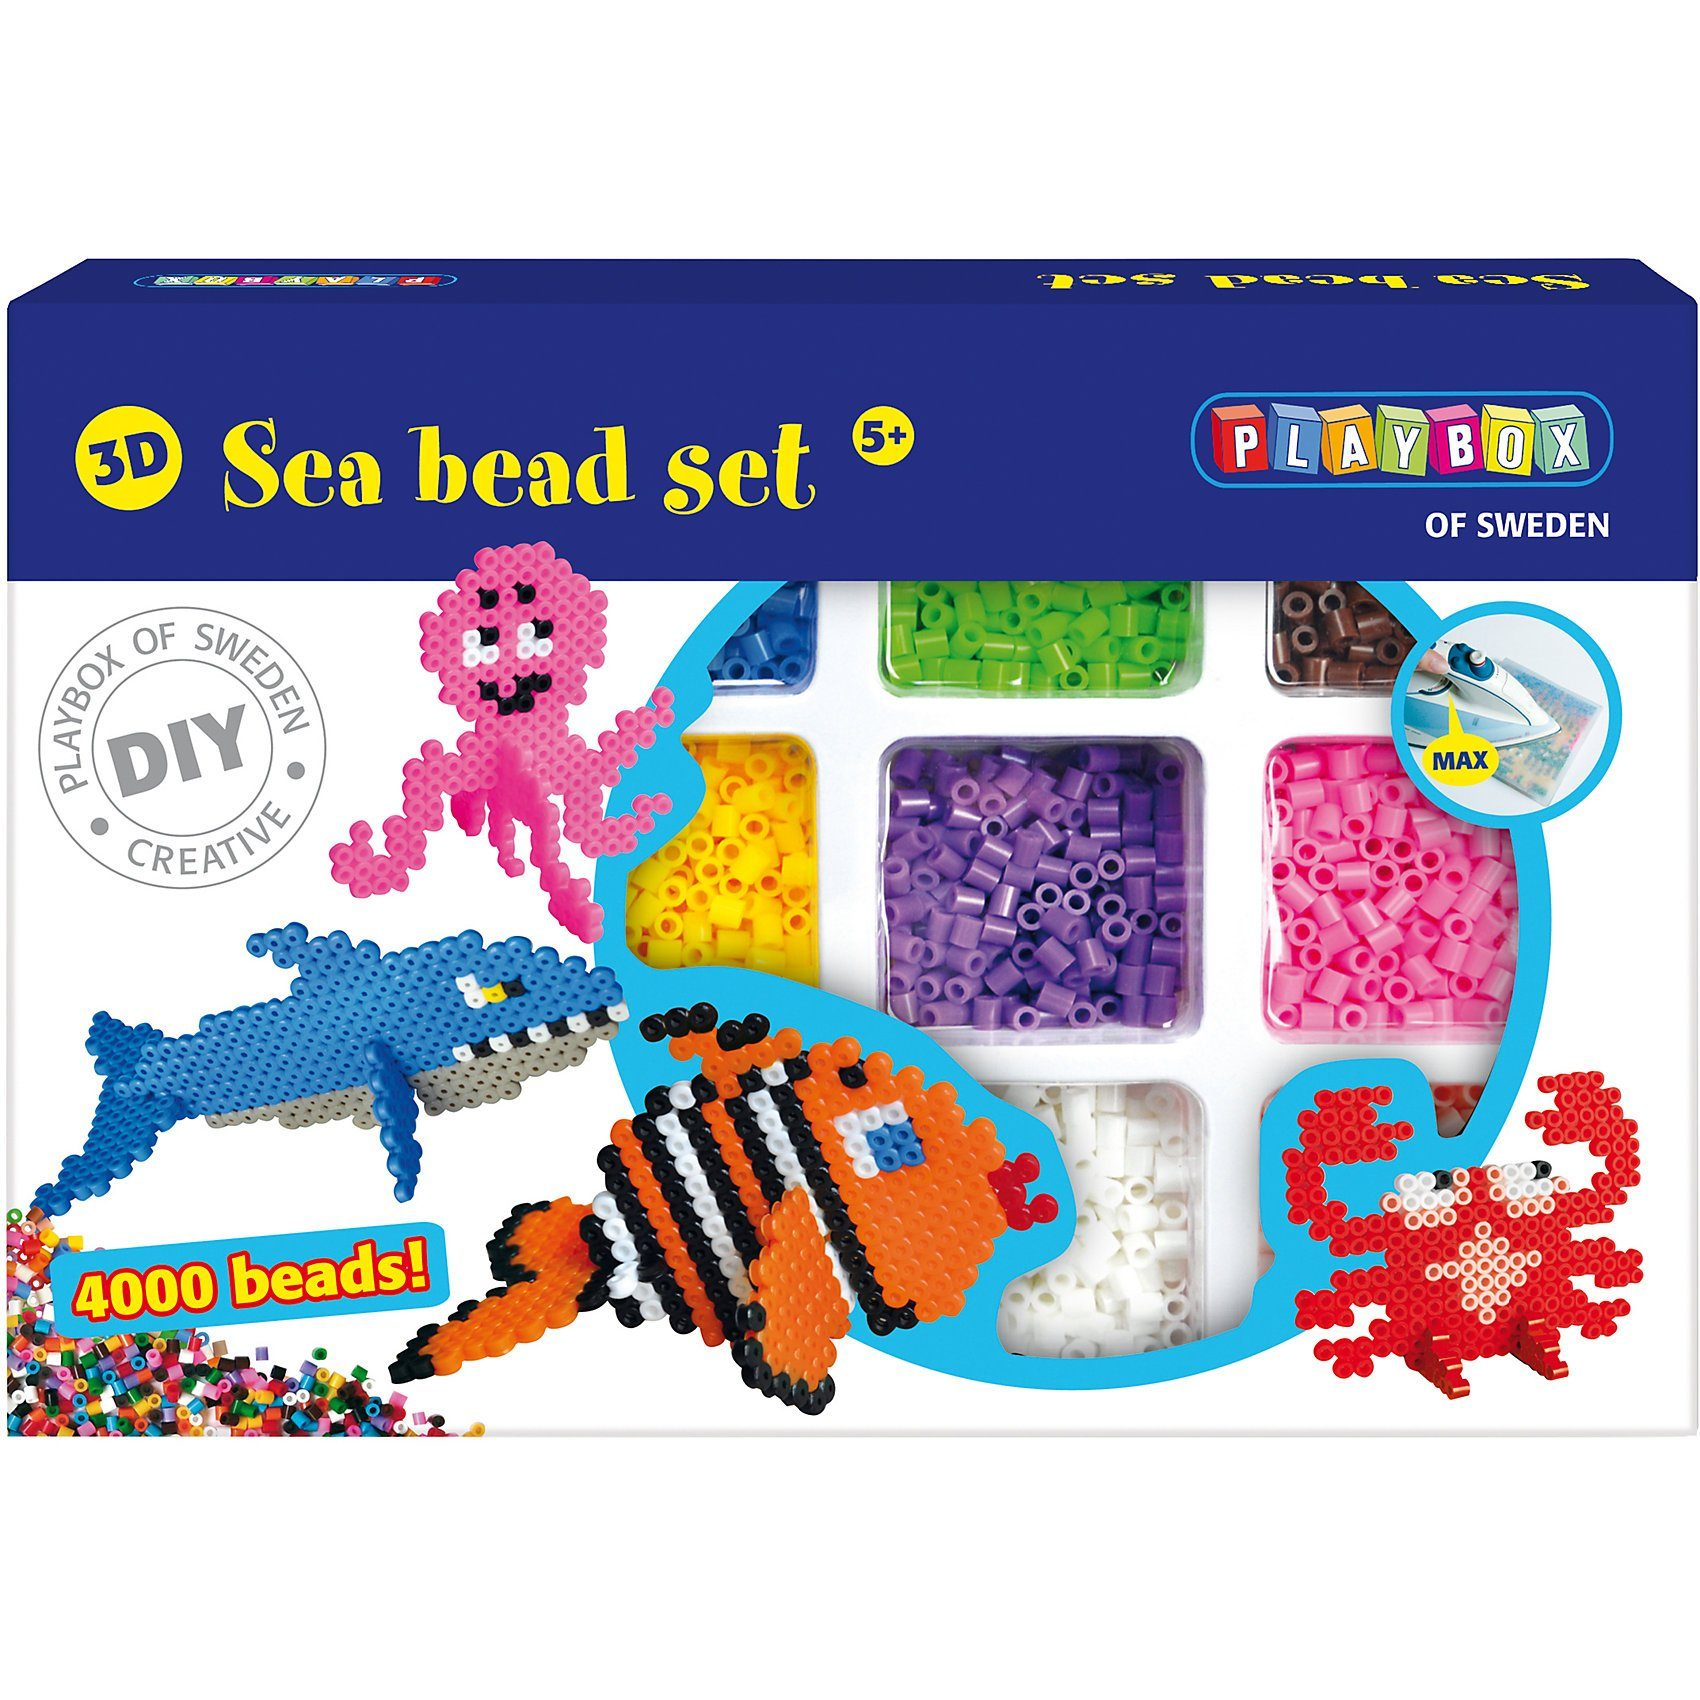 Playbox 3D-Bügelperlen Set Meerestiere, 4.000 Perlen